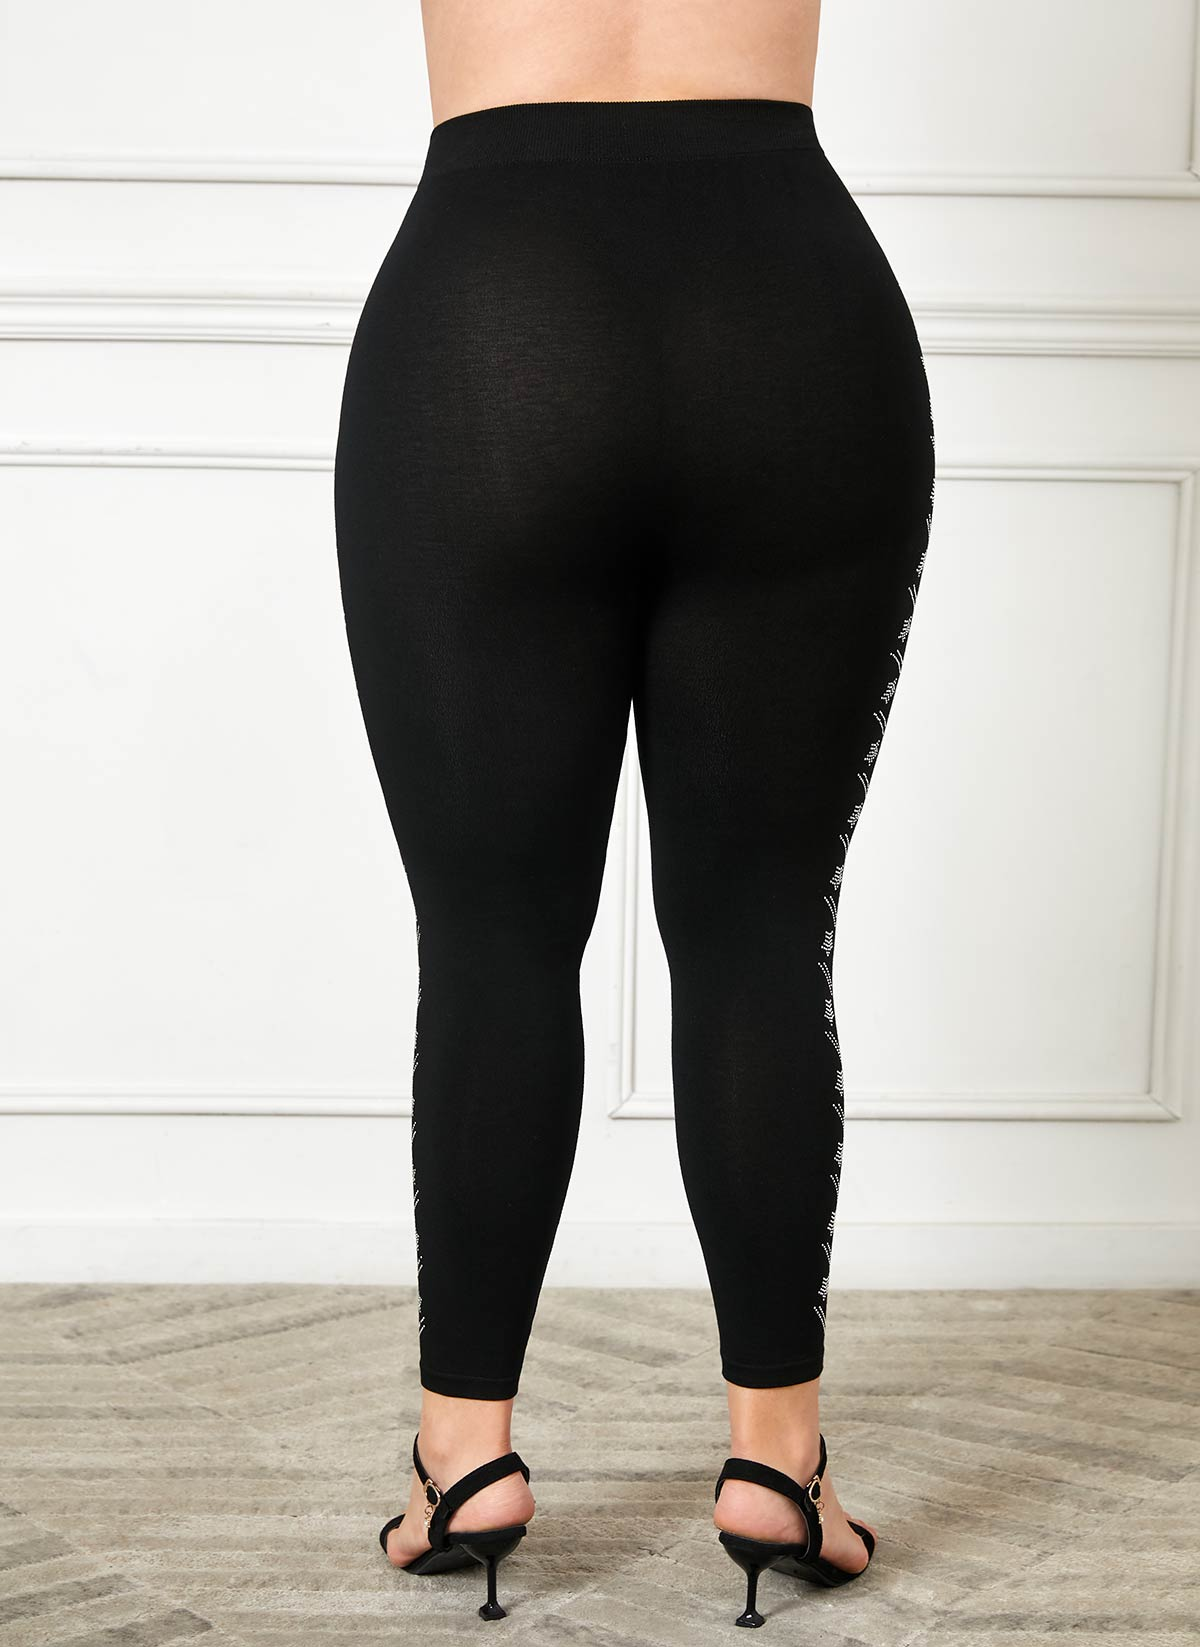 Plus Size High Waist Rhinestone Legging